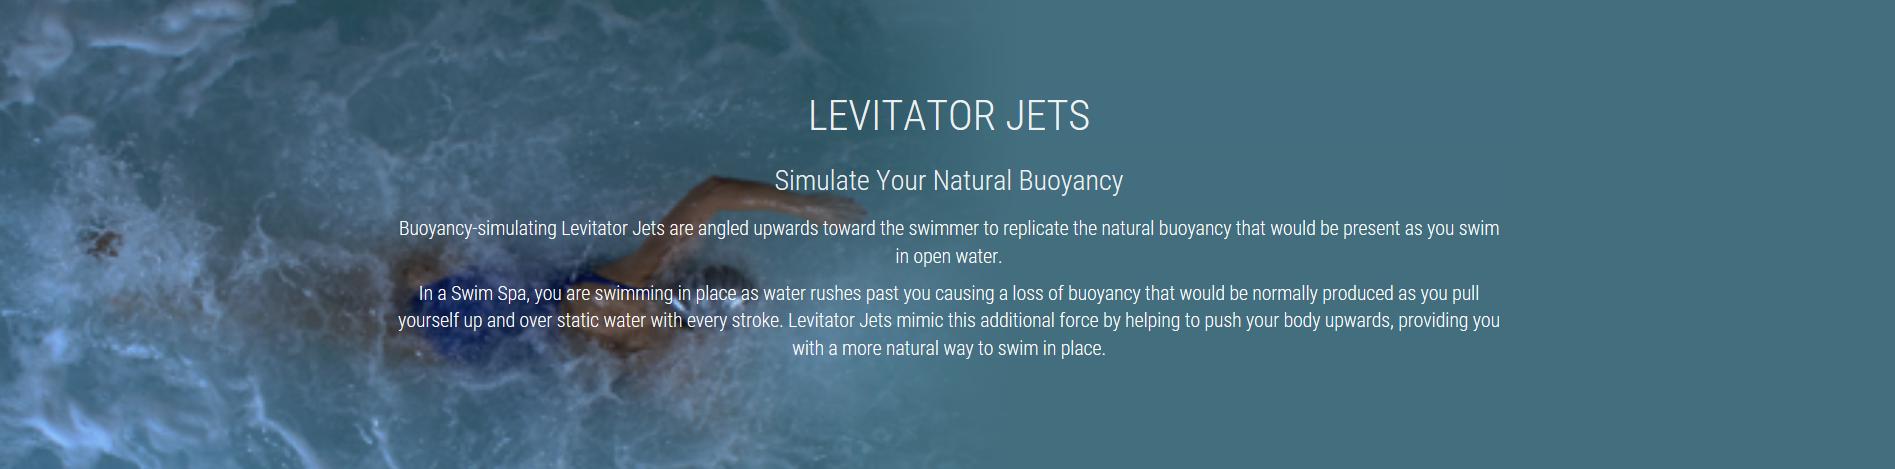 Levitator Jets.png